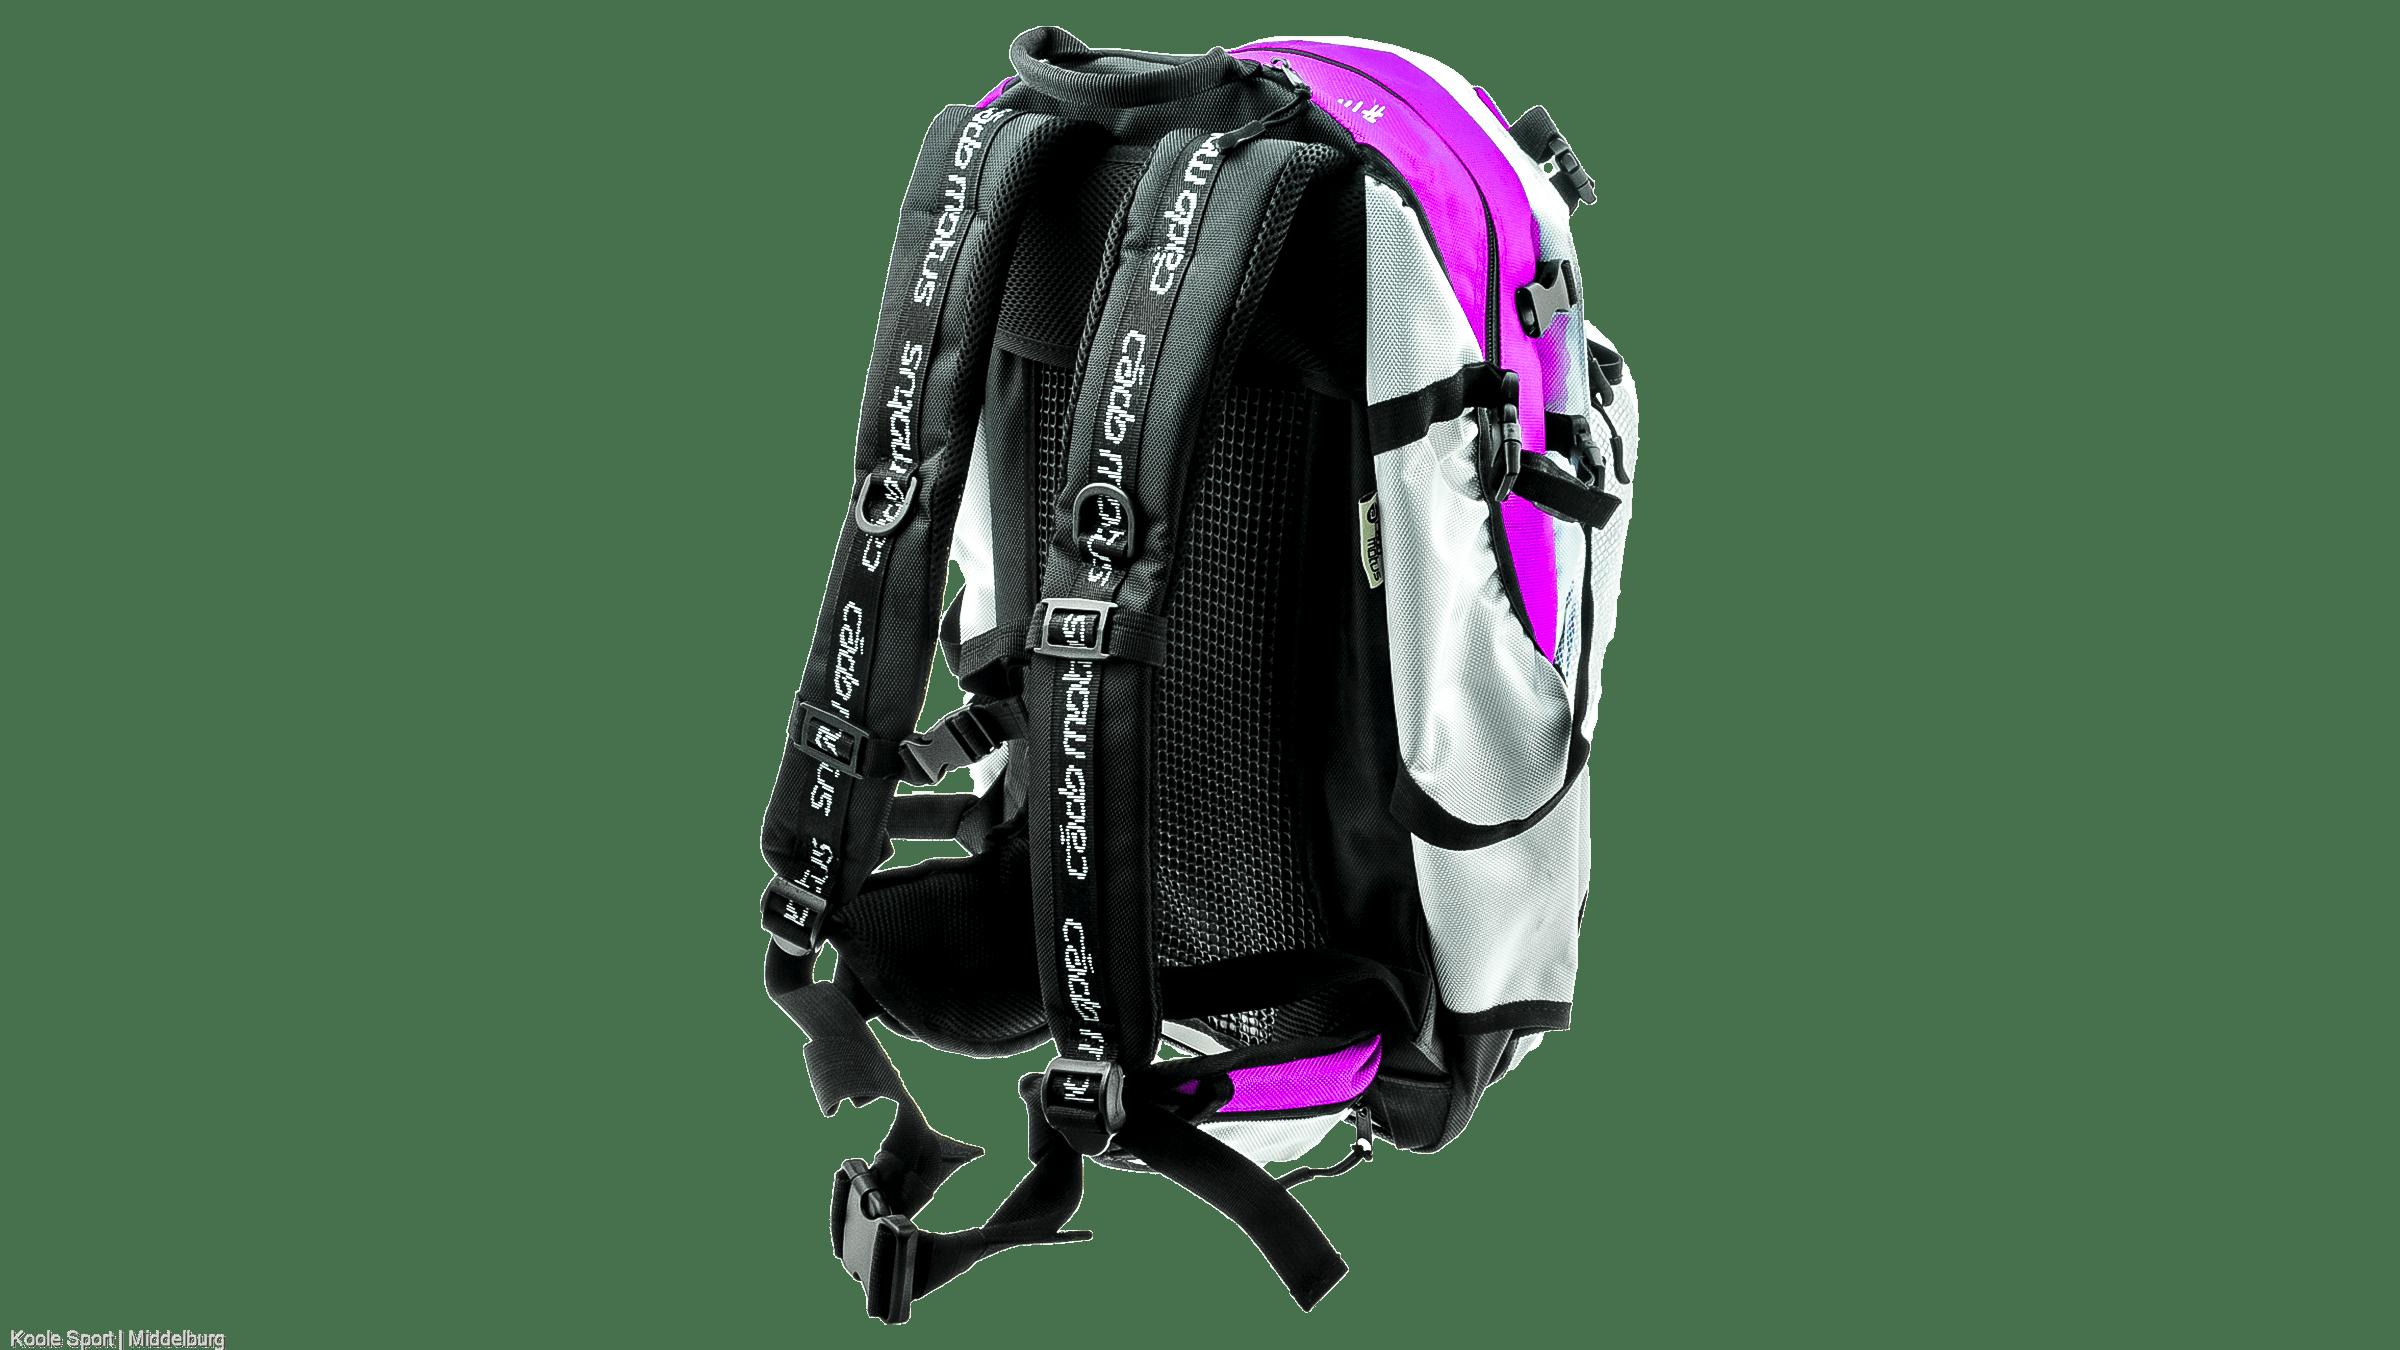 d749075d9e0 CadoMotus Airflow gear skate skeeler bag - fuchsia/white bestellen ...